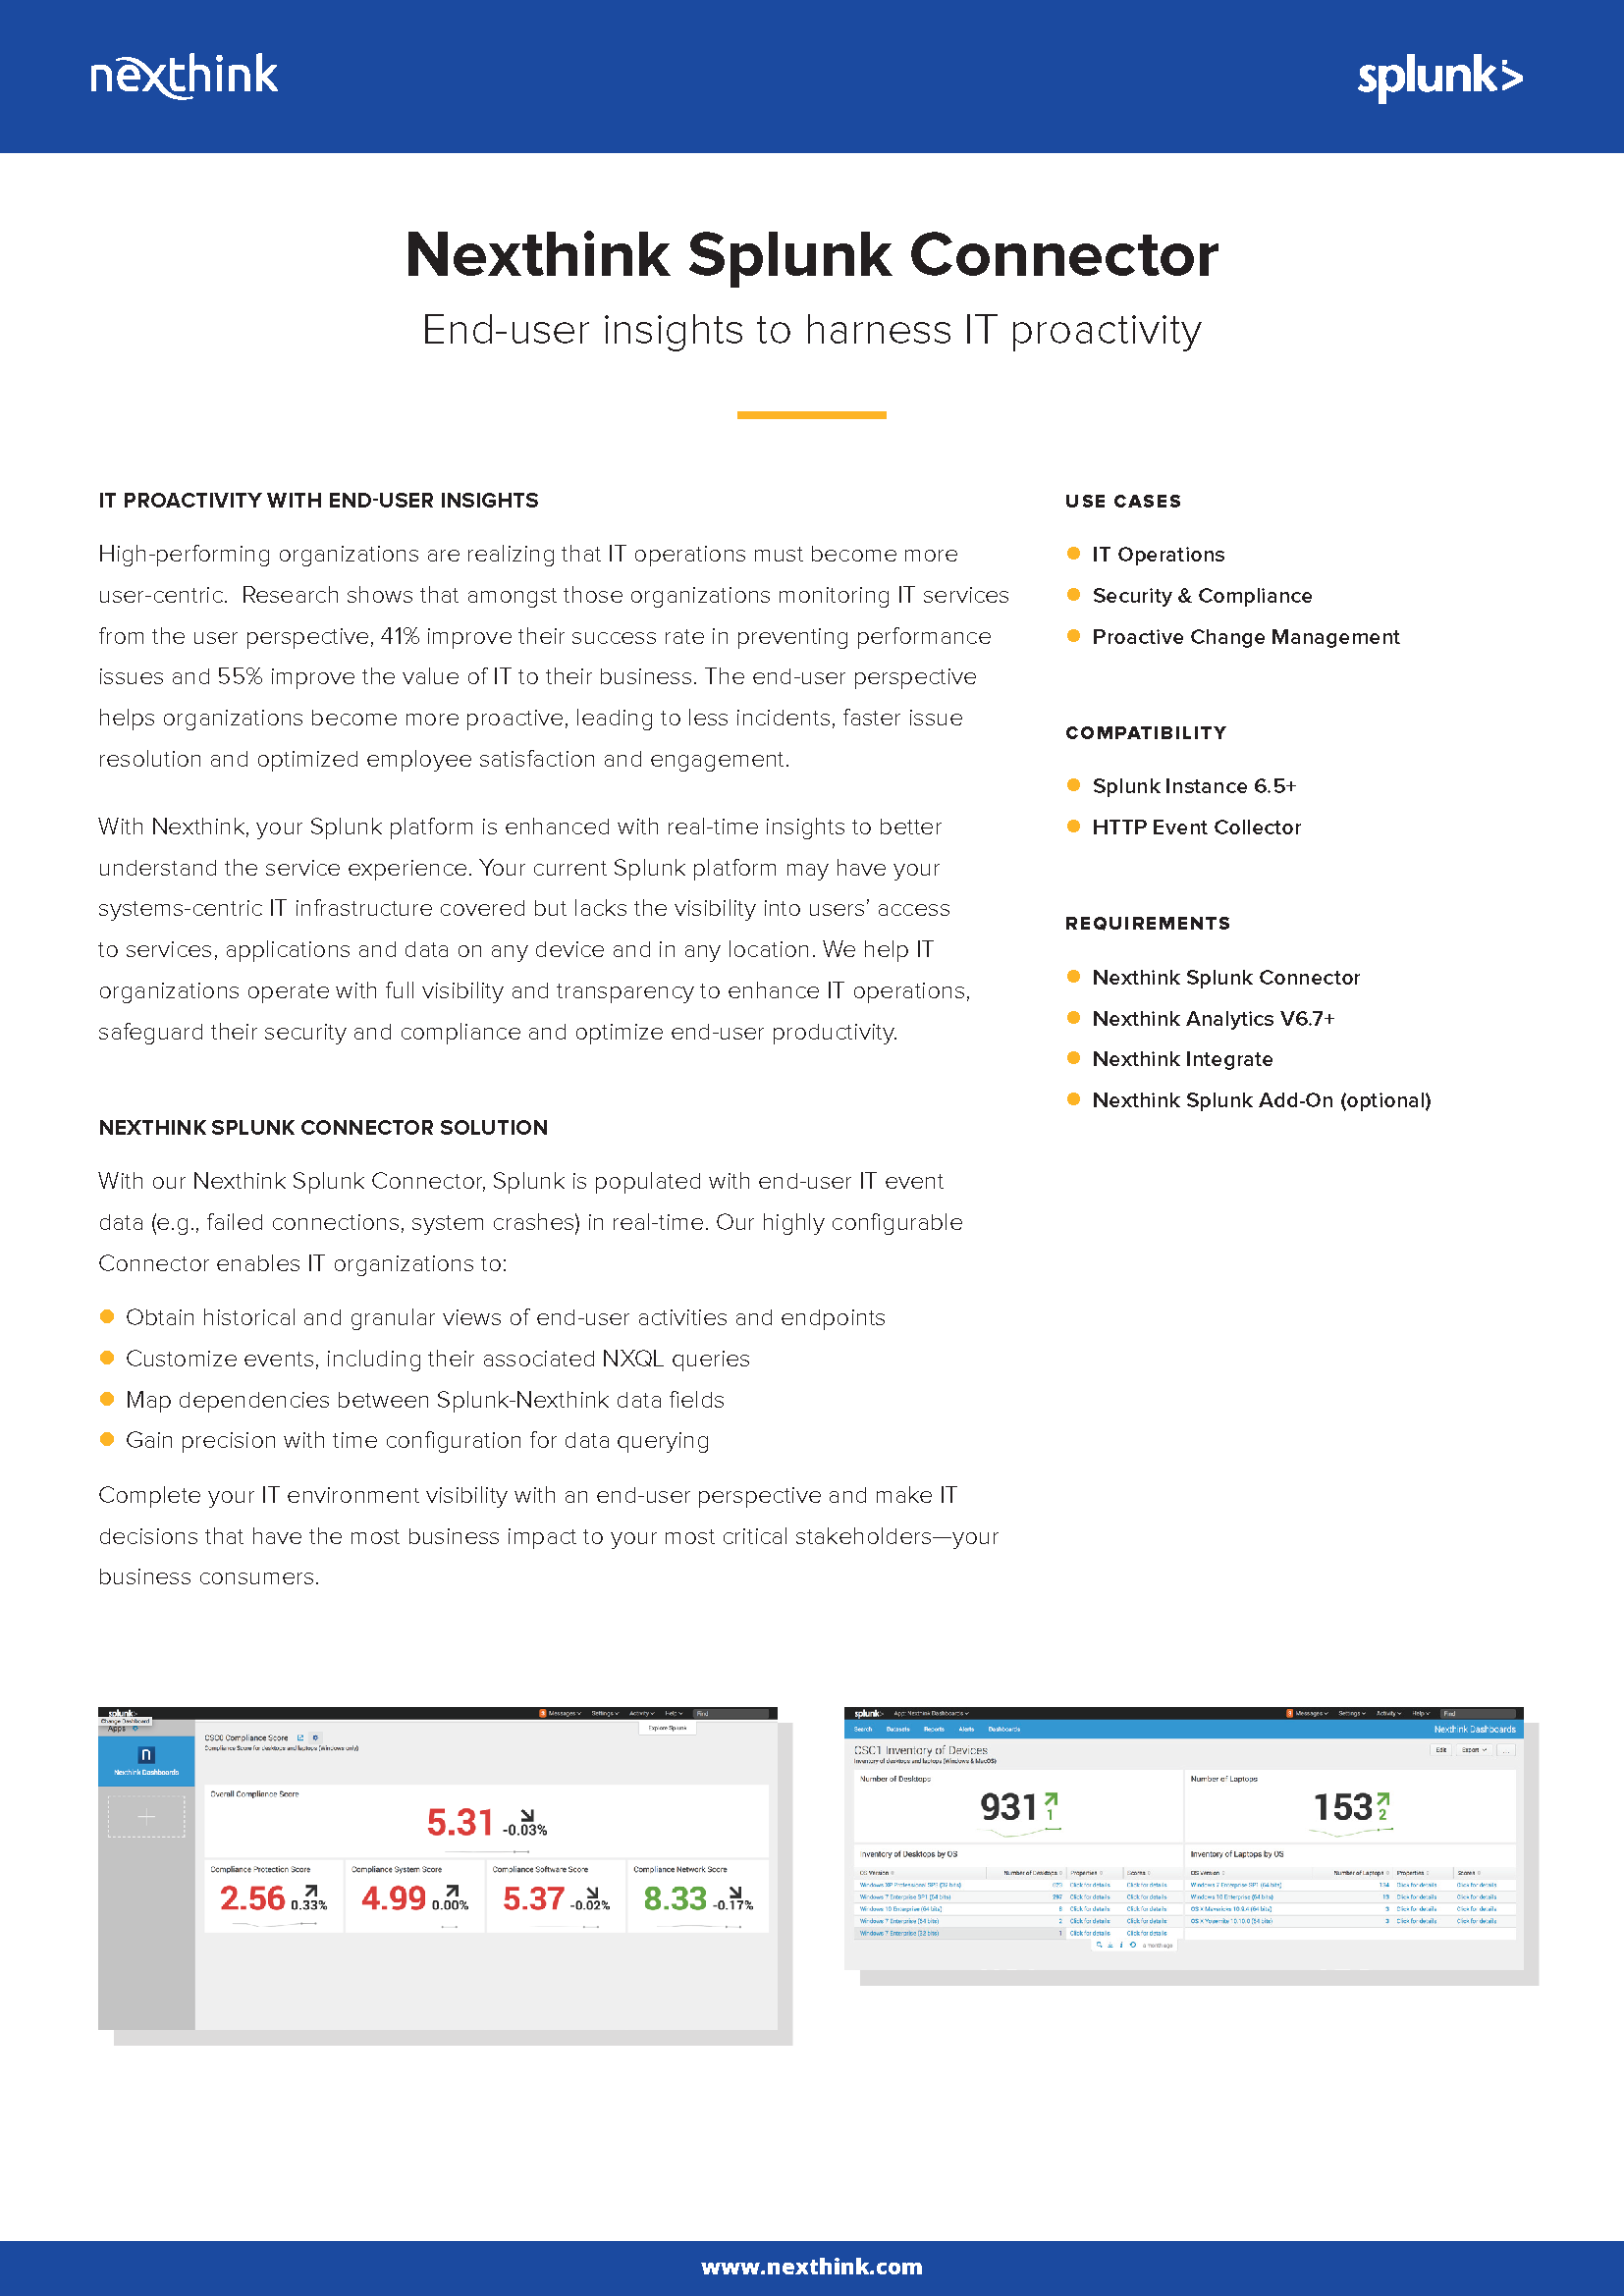 Splunk Connector Fact Sheet